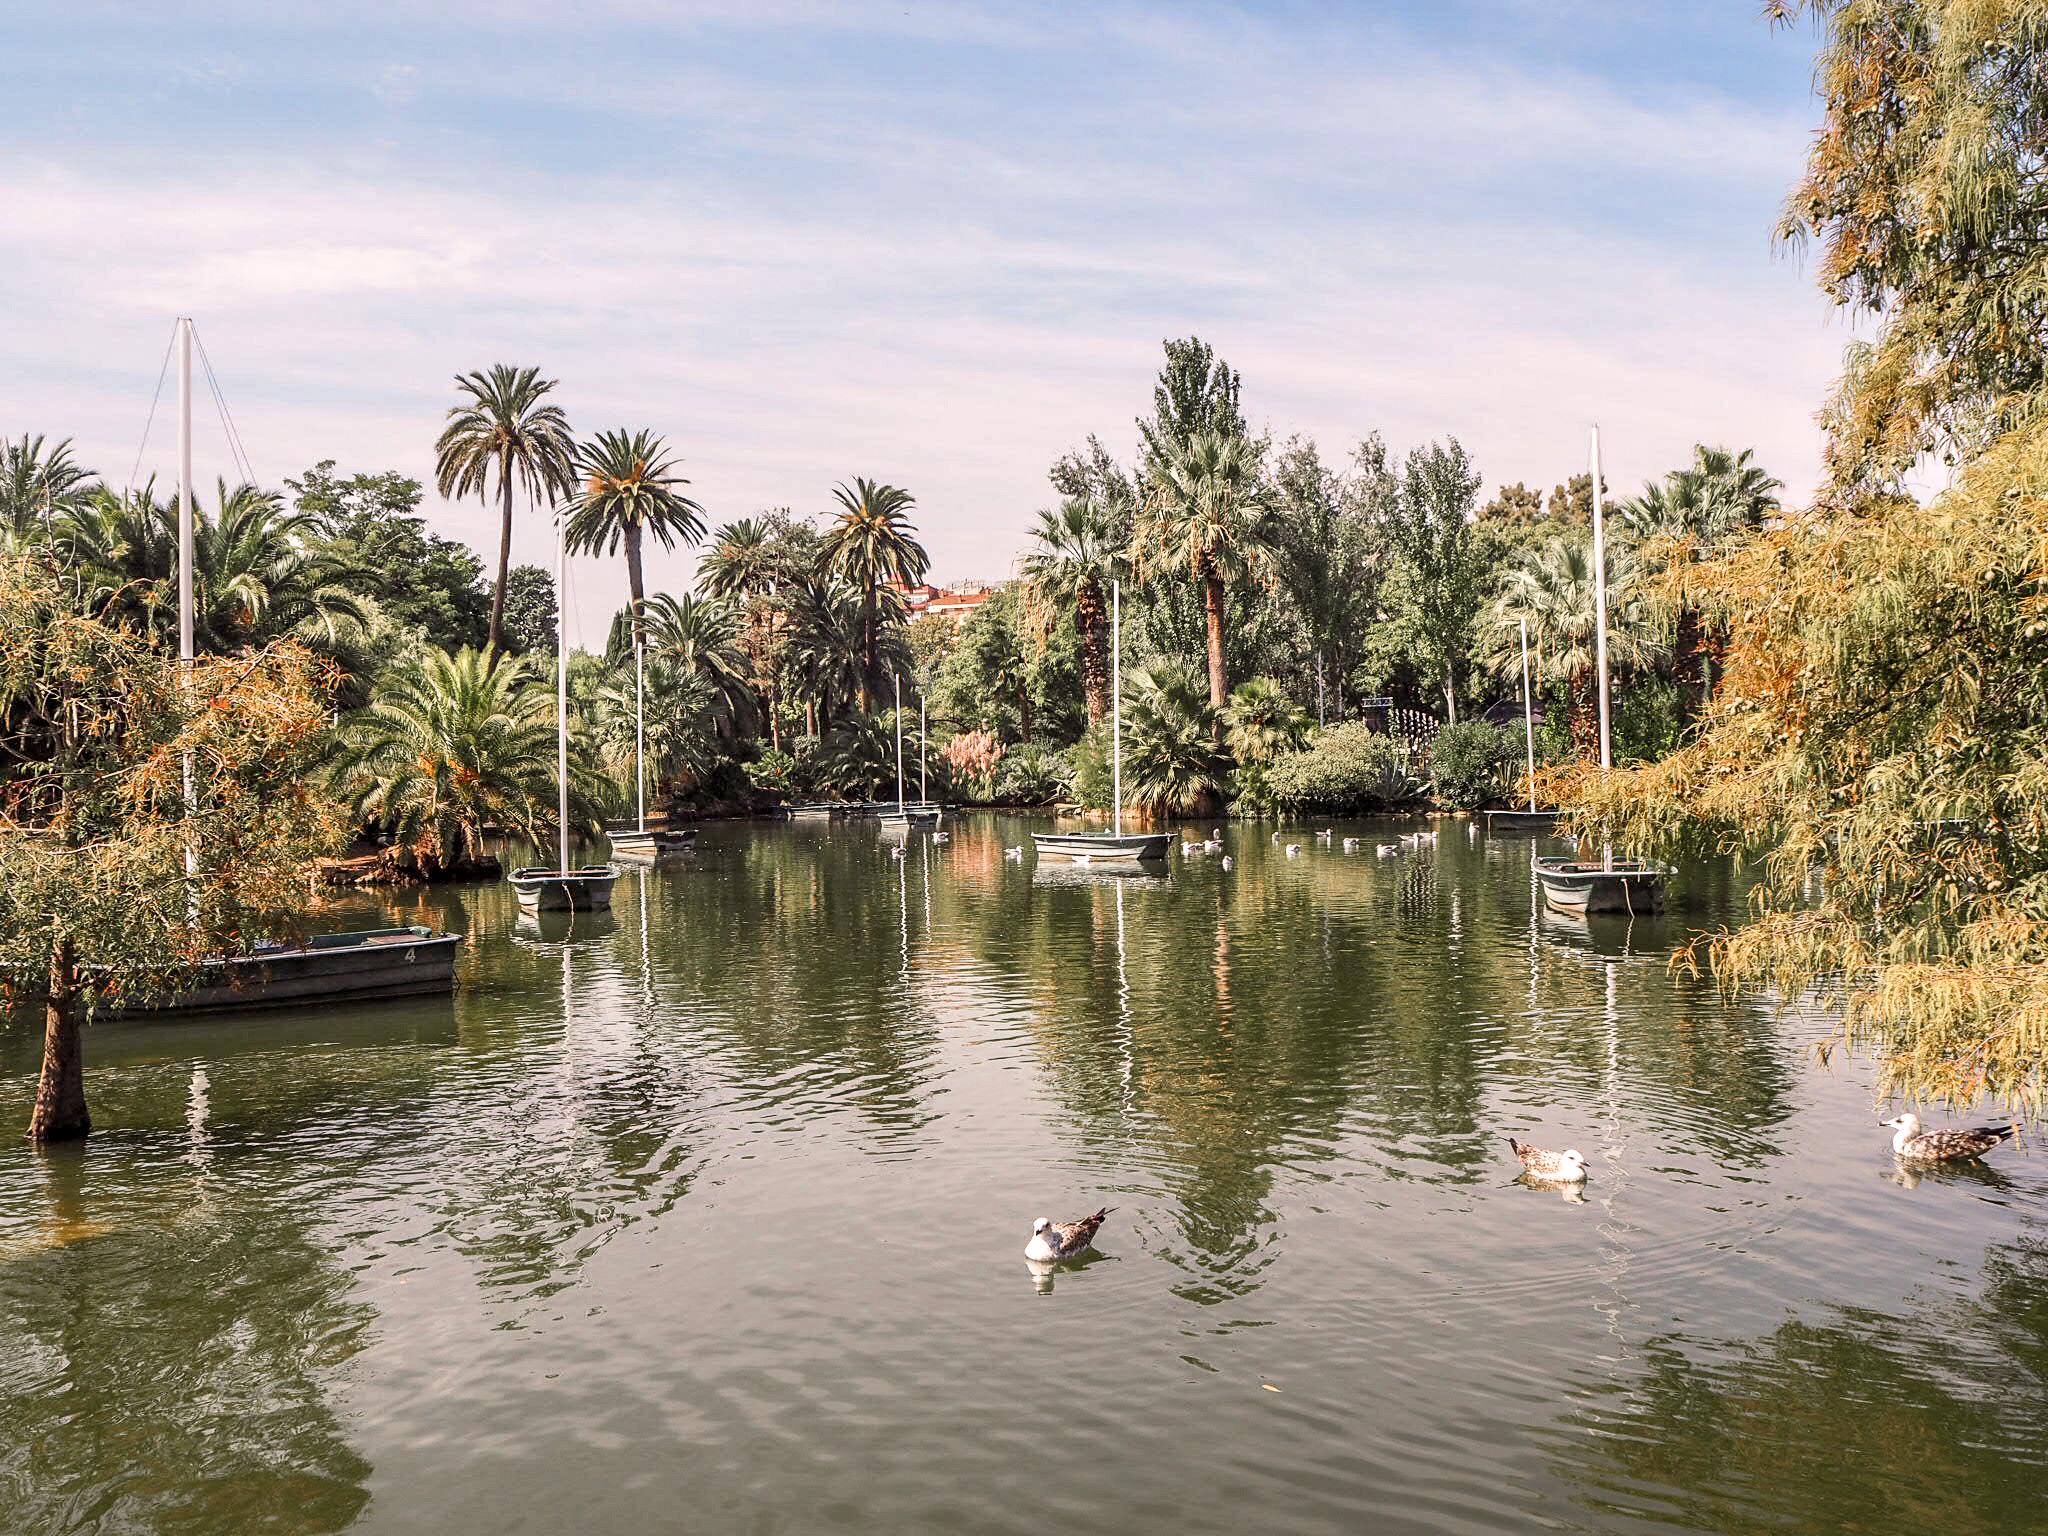 Parc de la Ciutadella tekojärvi